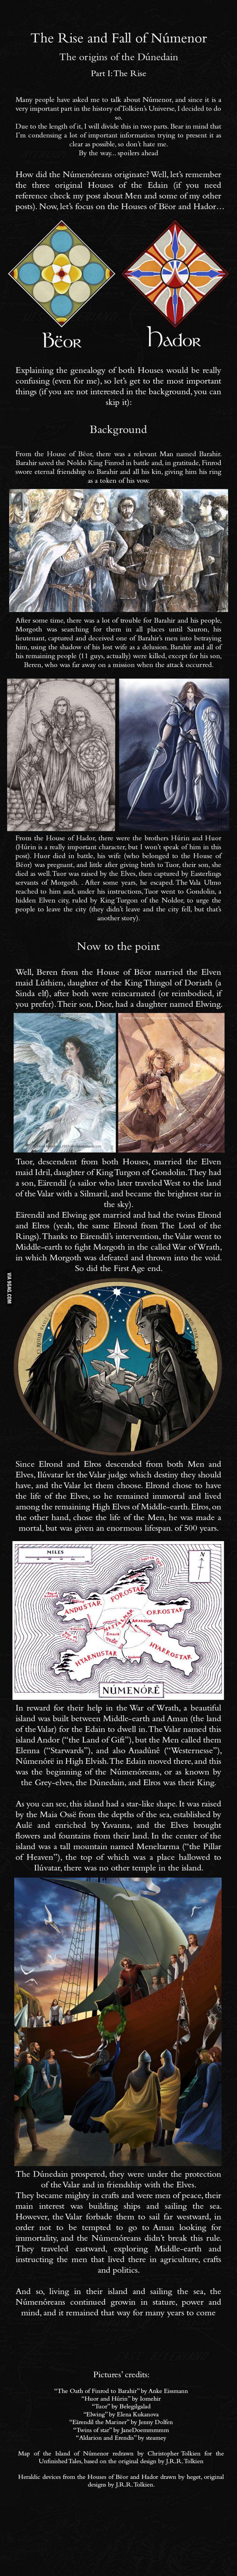 Númenor and the Dúnedain: Part I - J.R.R. Tolkien's Mythology